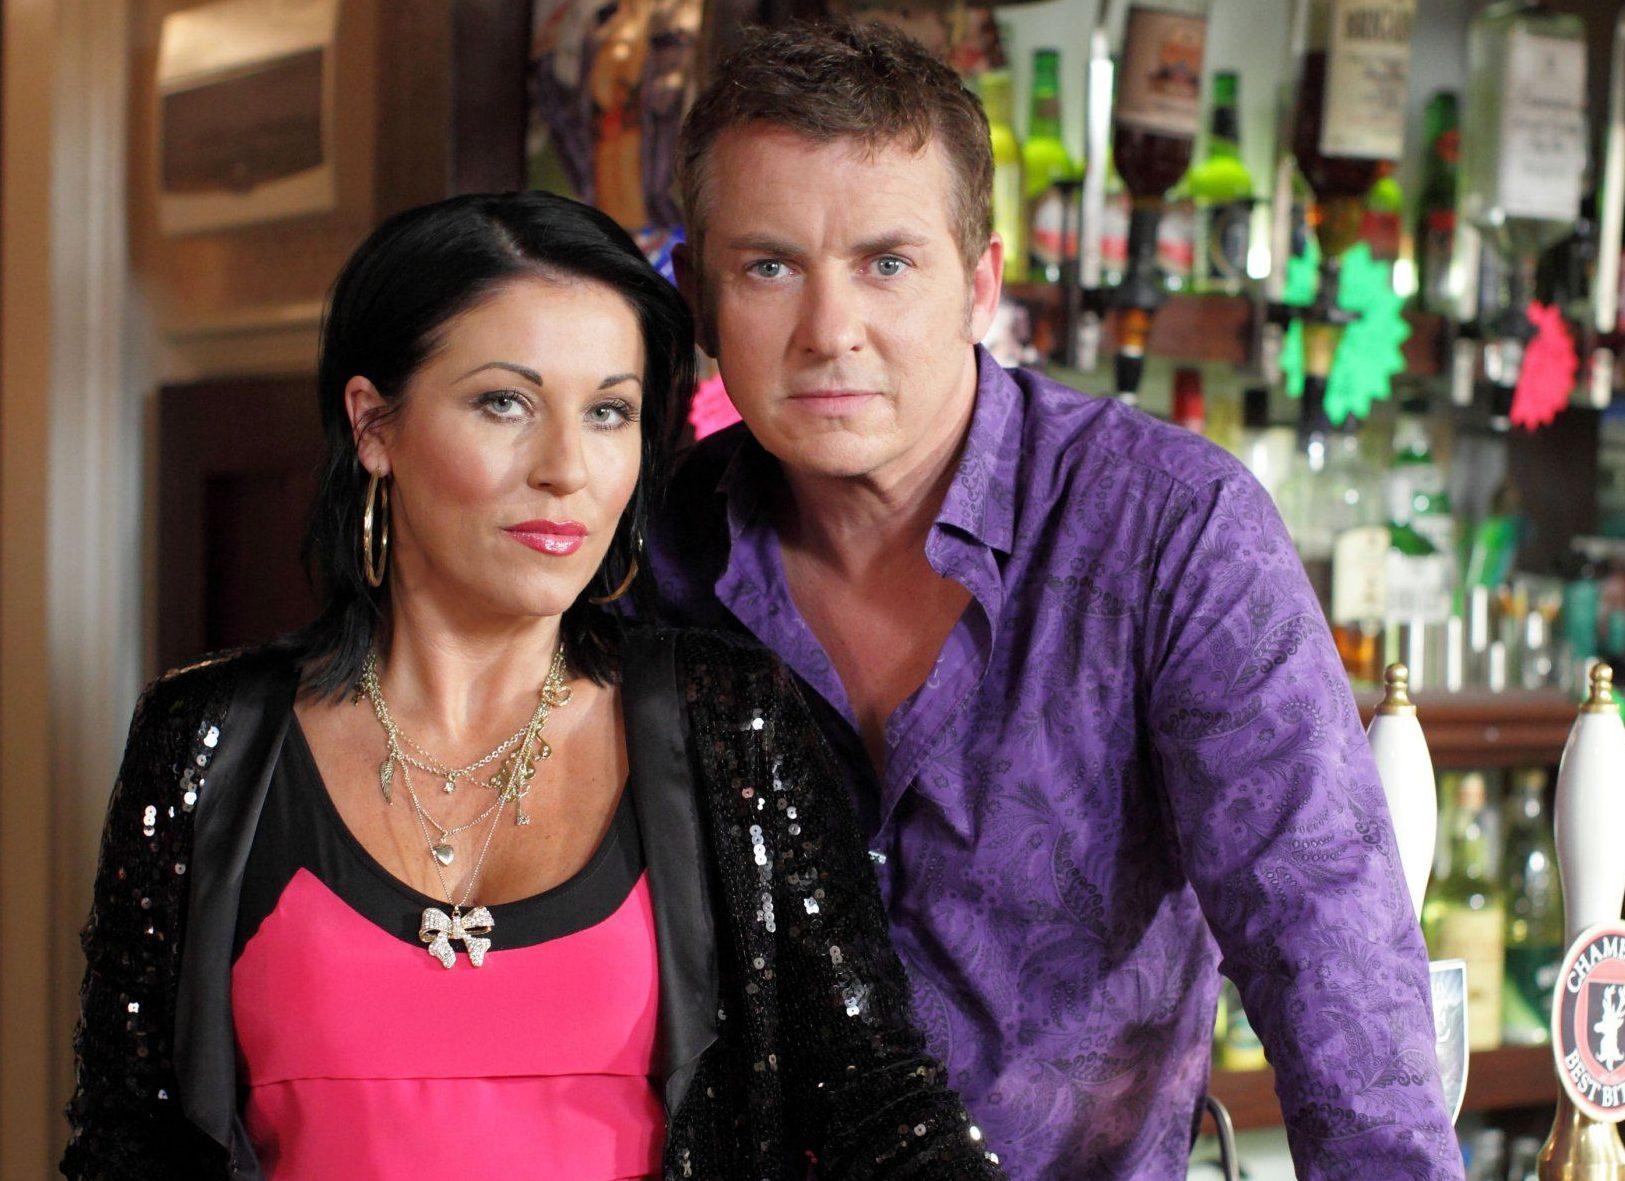 Television Programme: EastEnders, with Jessie Wallace as Kat Moon and Shane Richie as Alfie Moon. Kat tells Alfie she's pregnant. 320934-eastenders.jpg